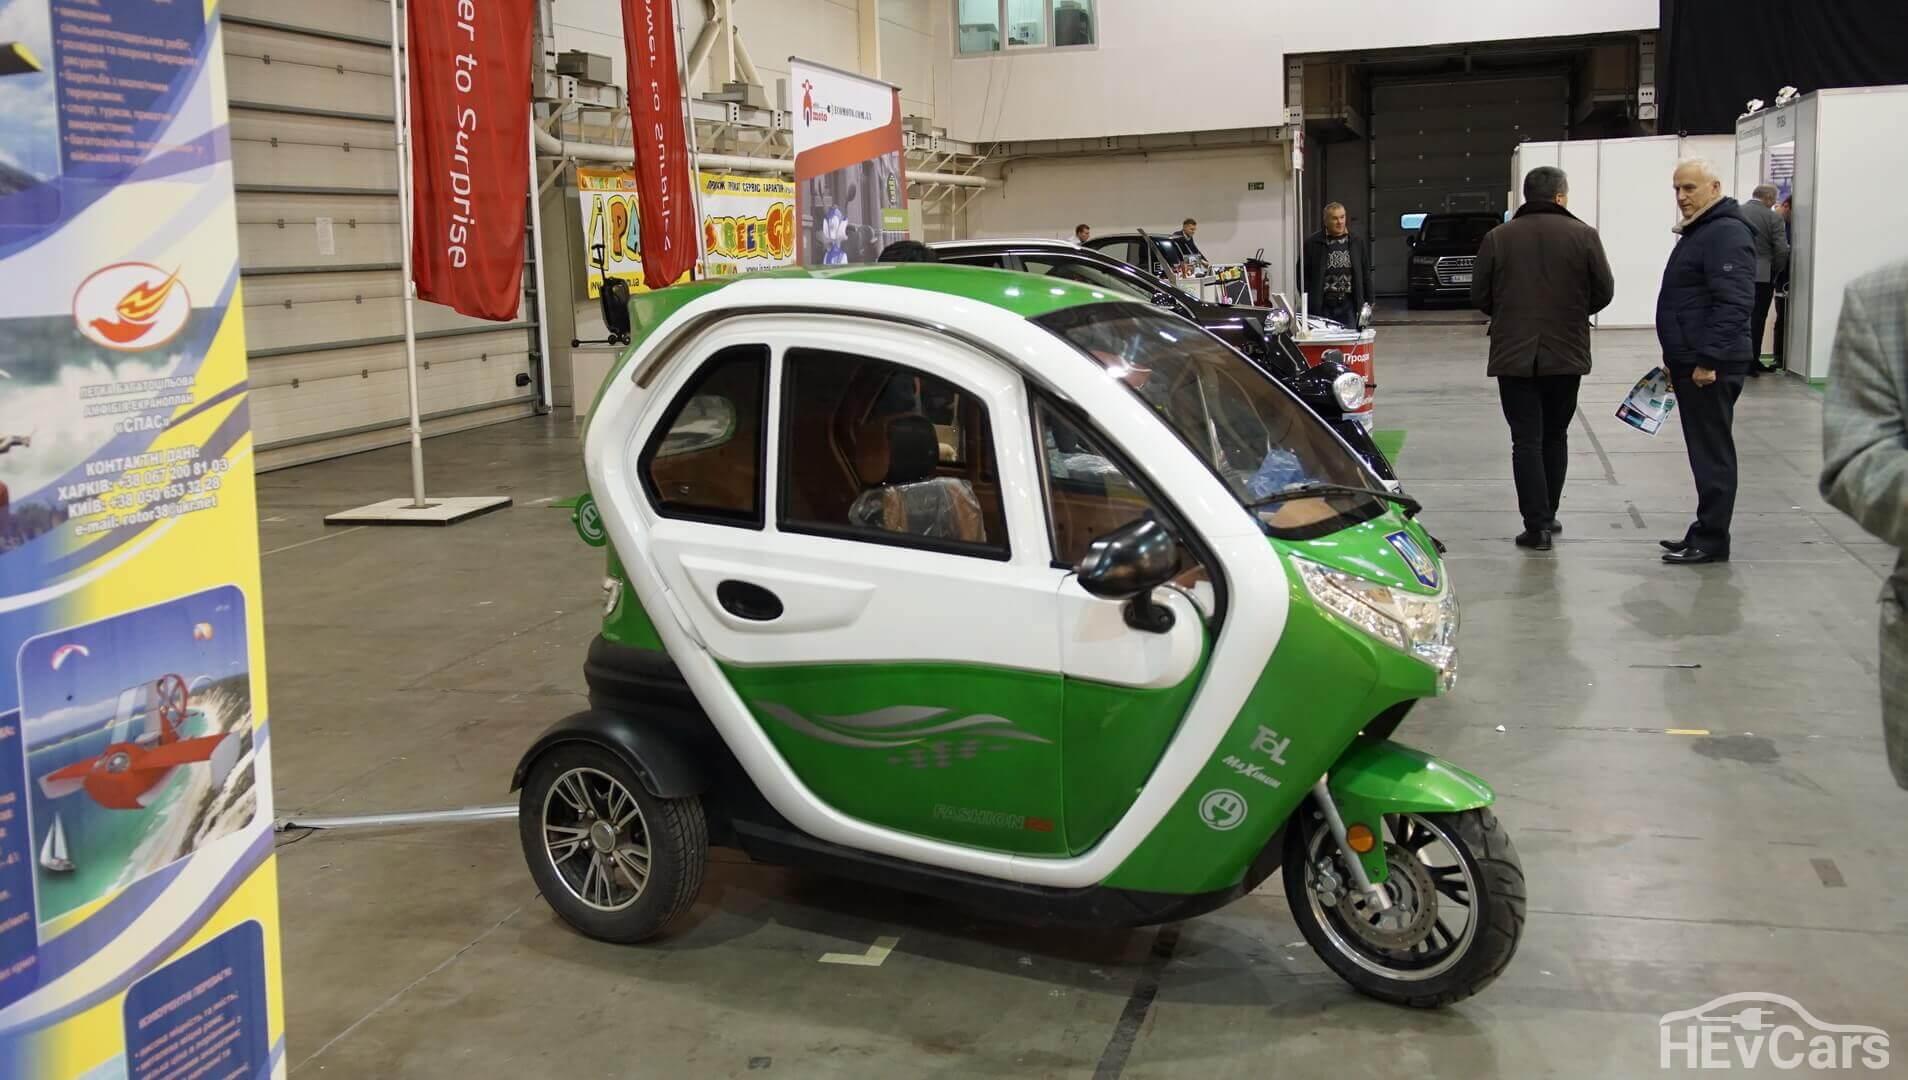 Электрический трицикл Bostrix